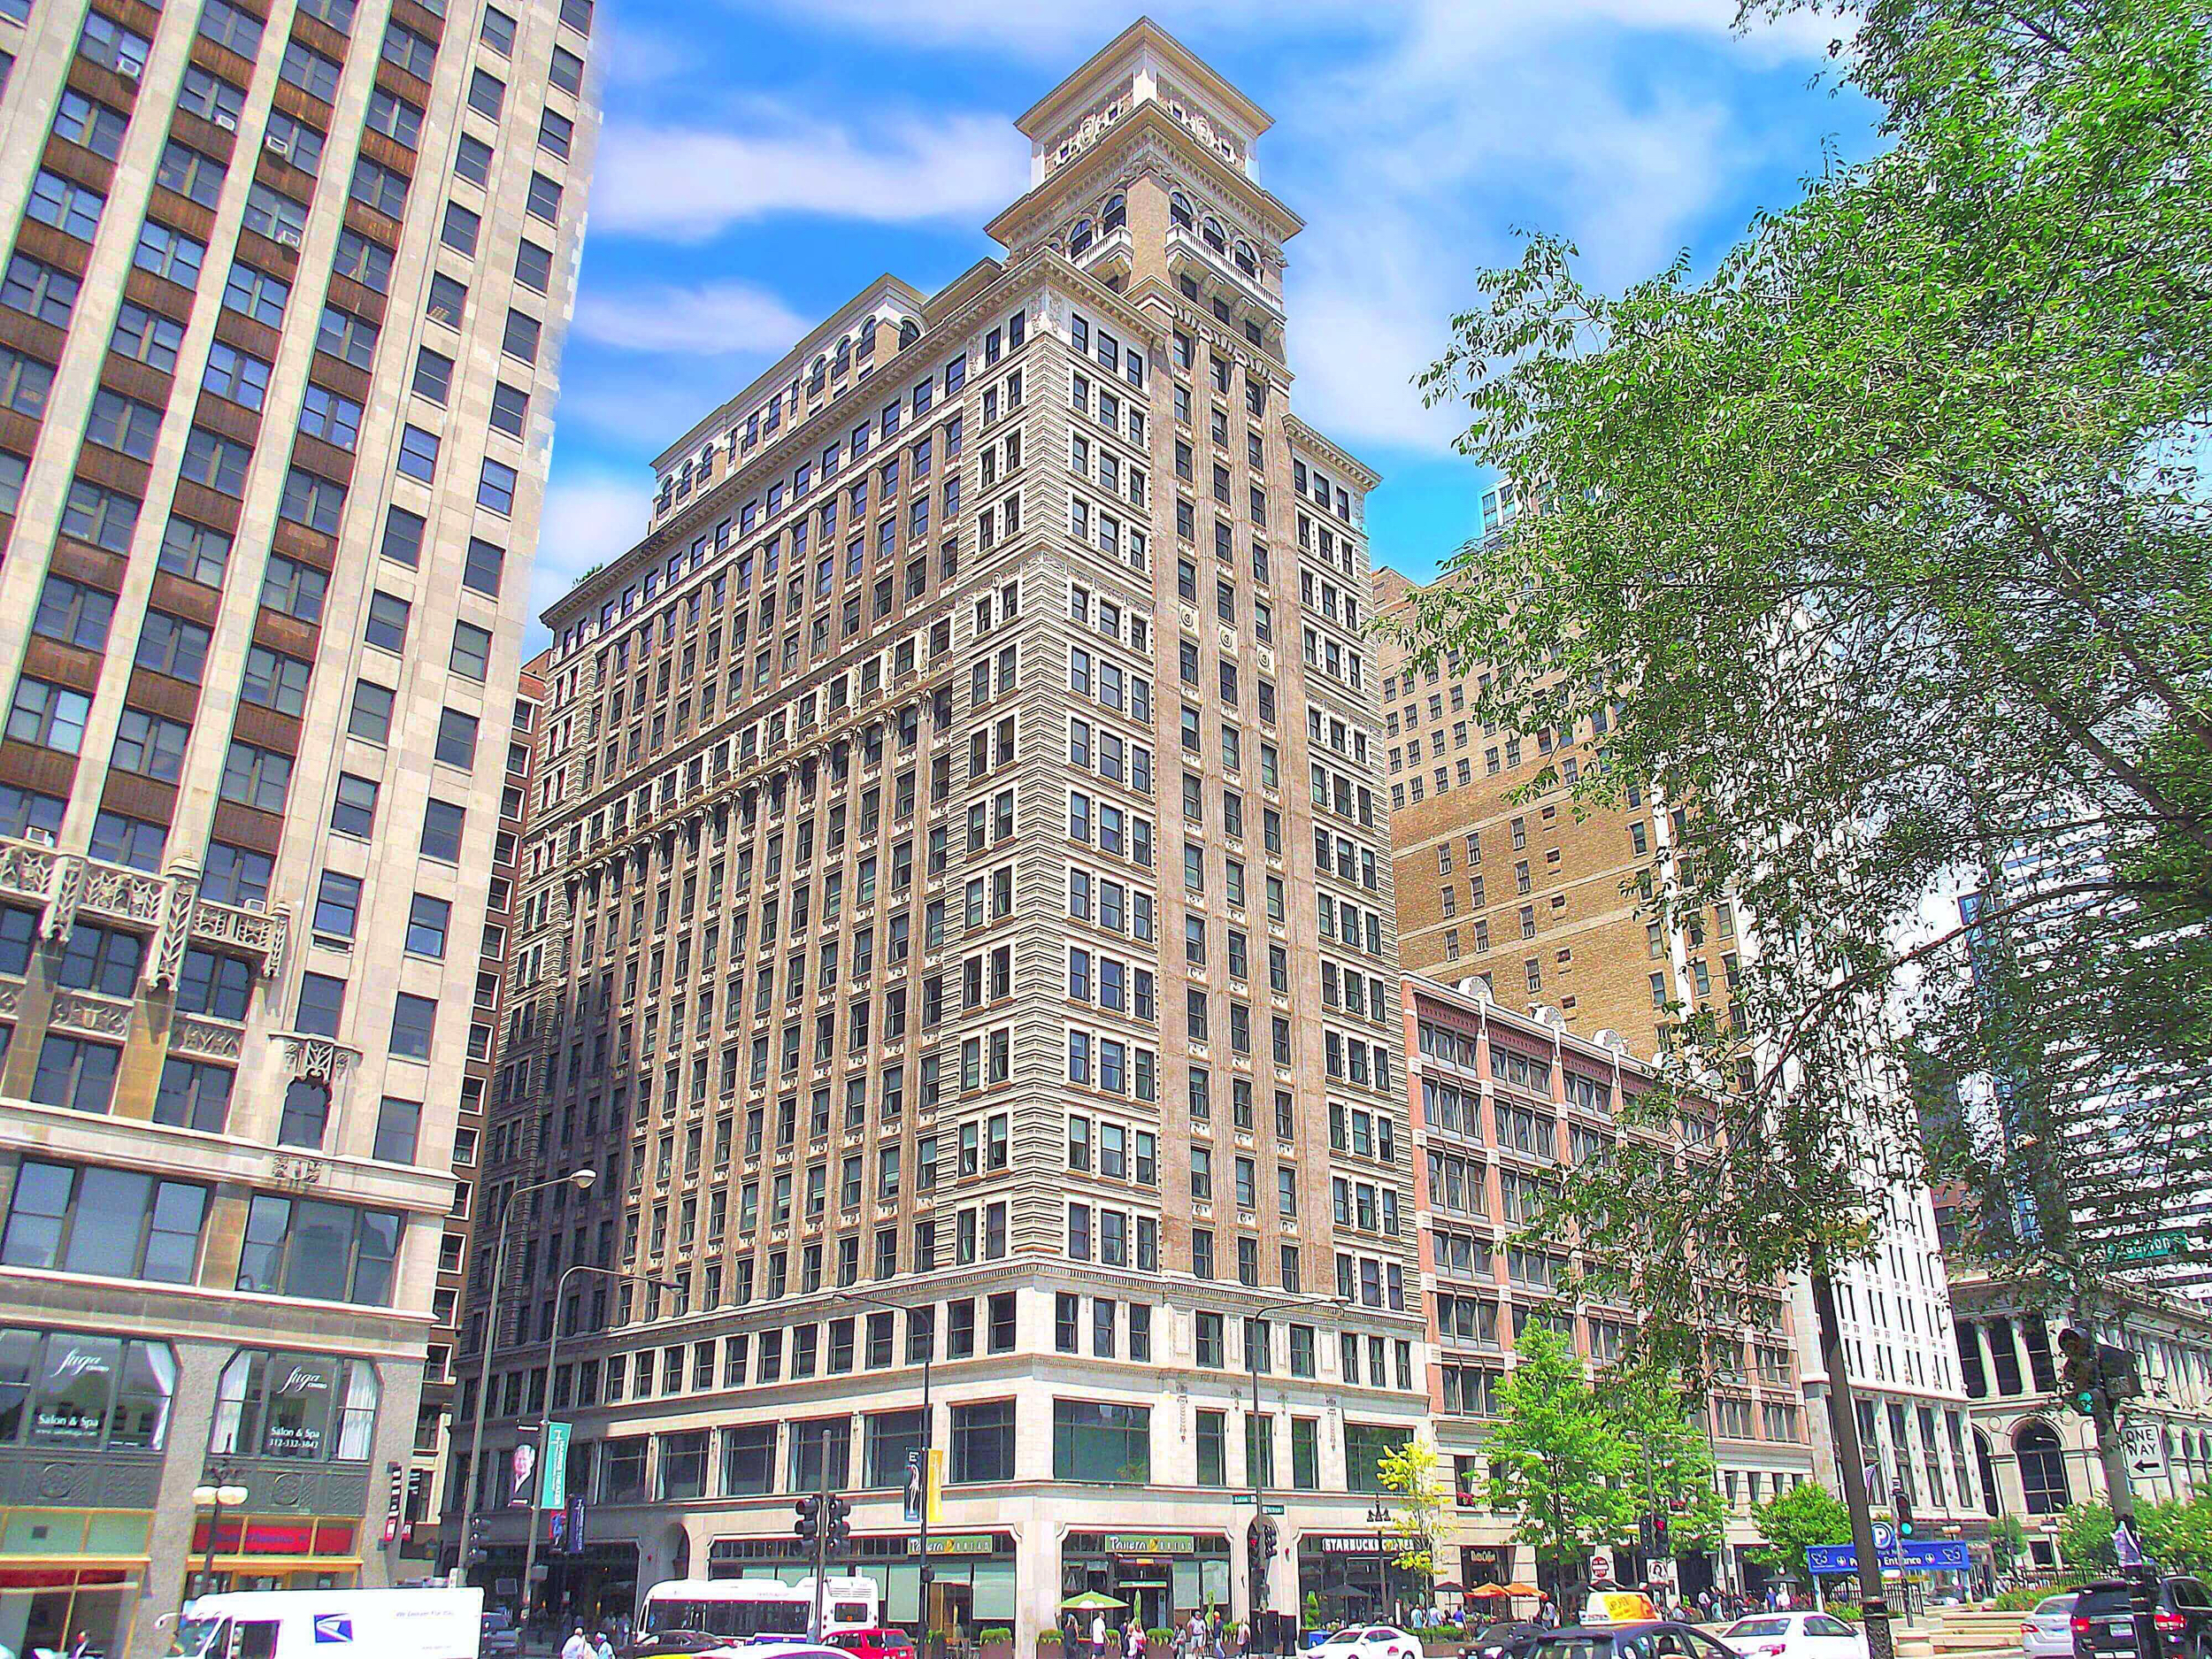 6 N  Michigan Condos For Sale or Rent   Six North Michigan